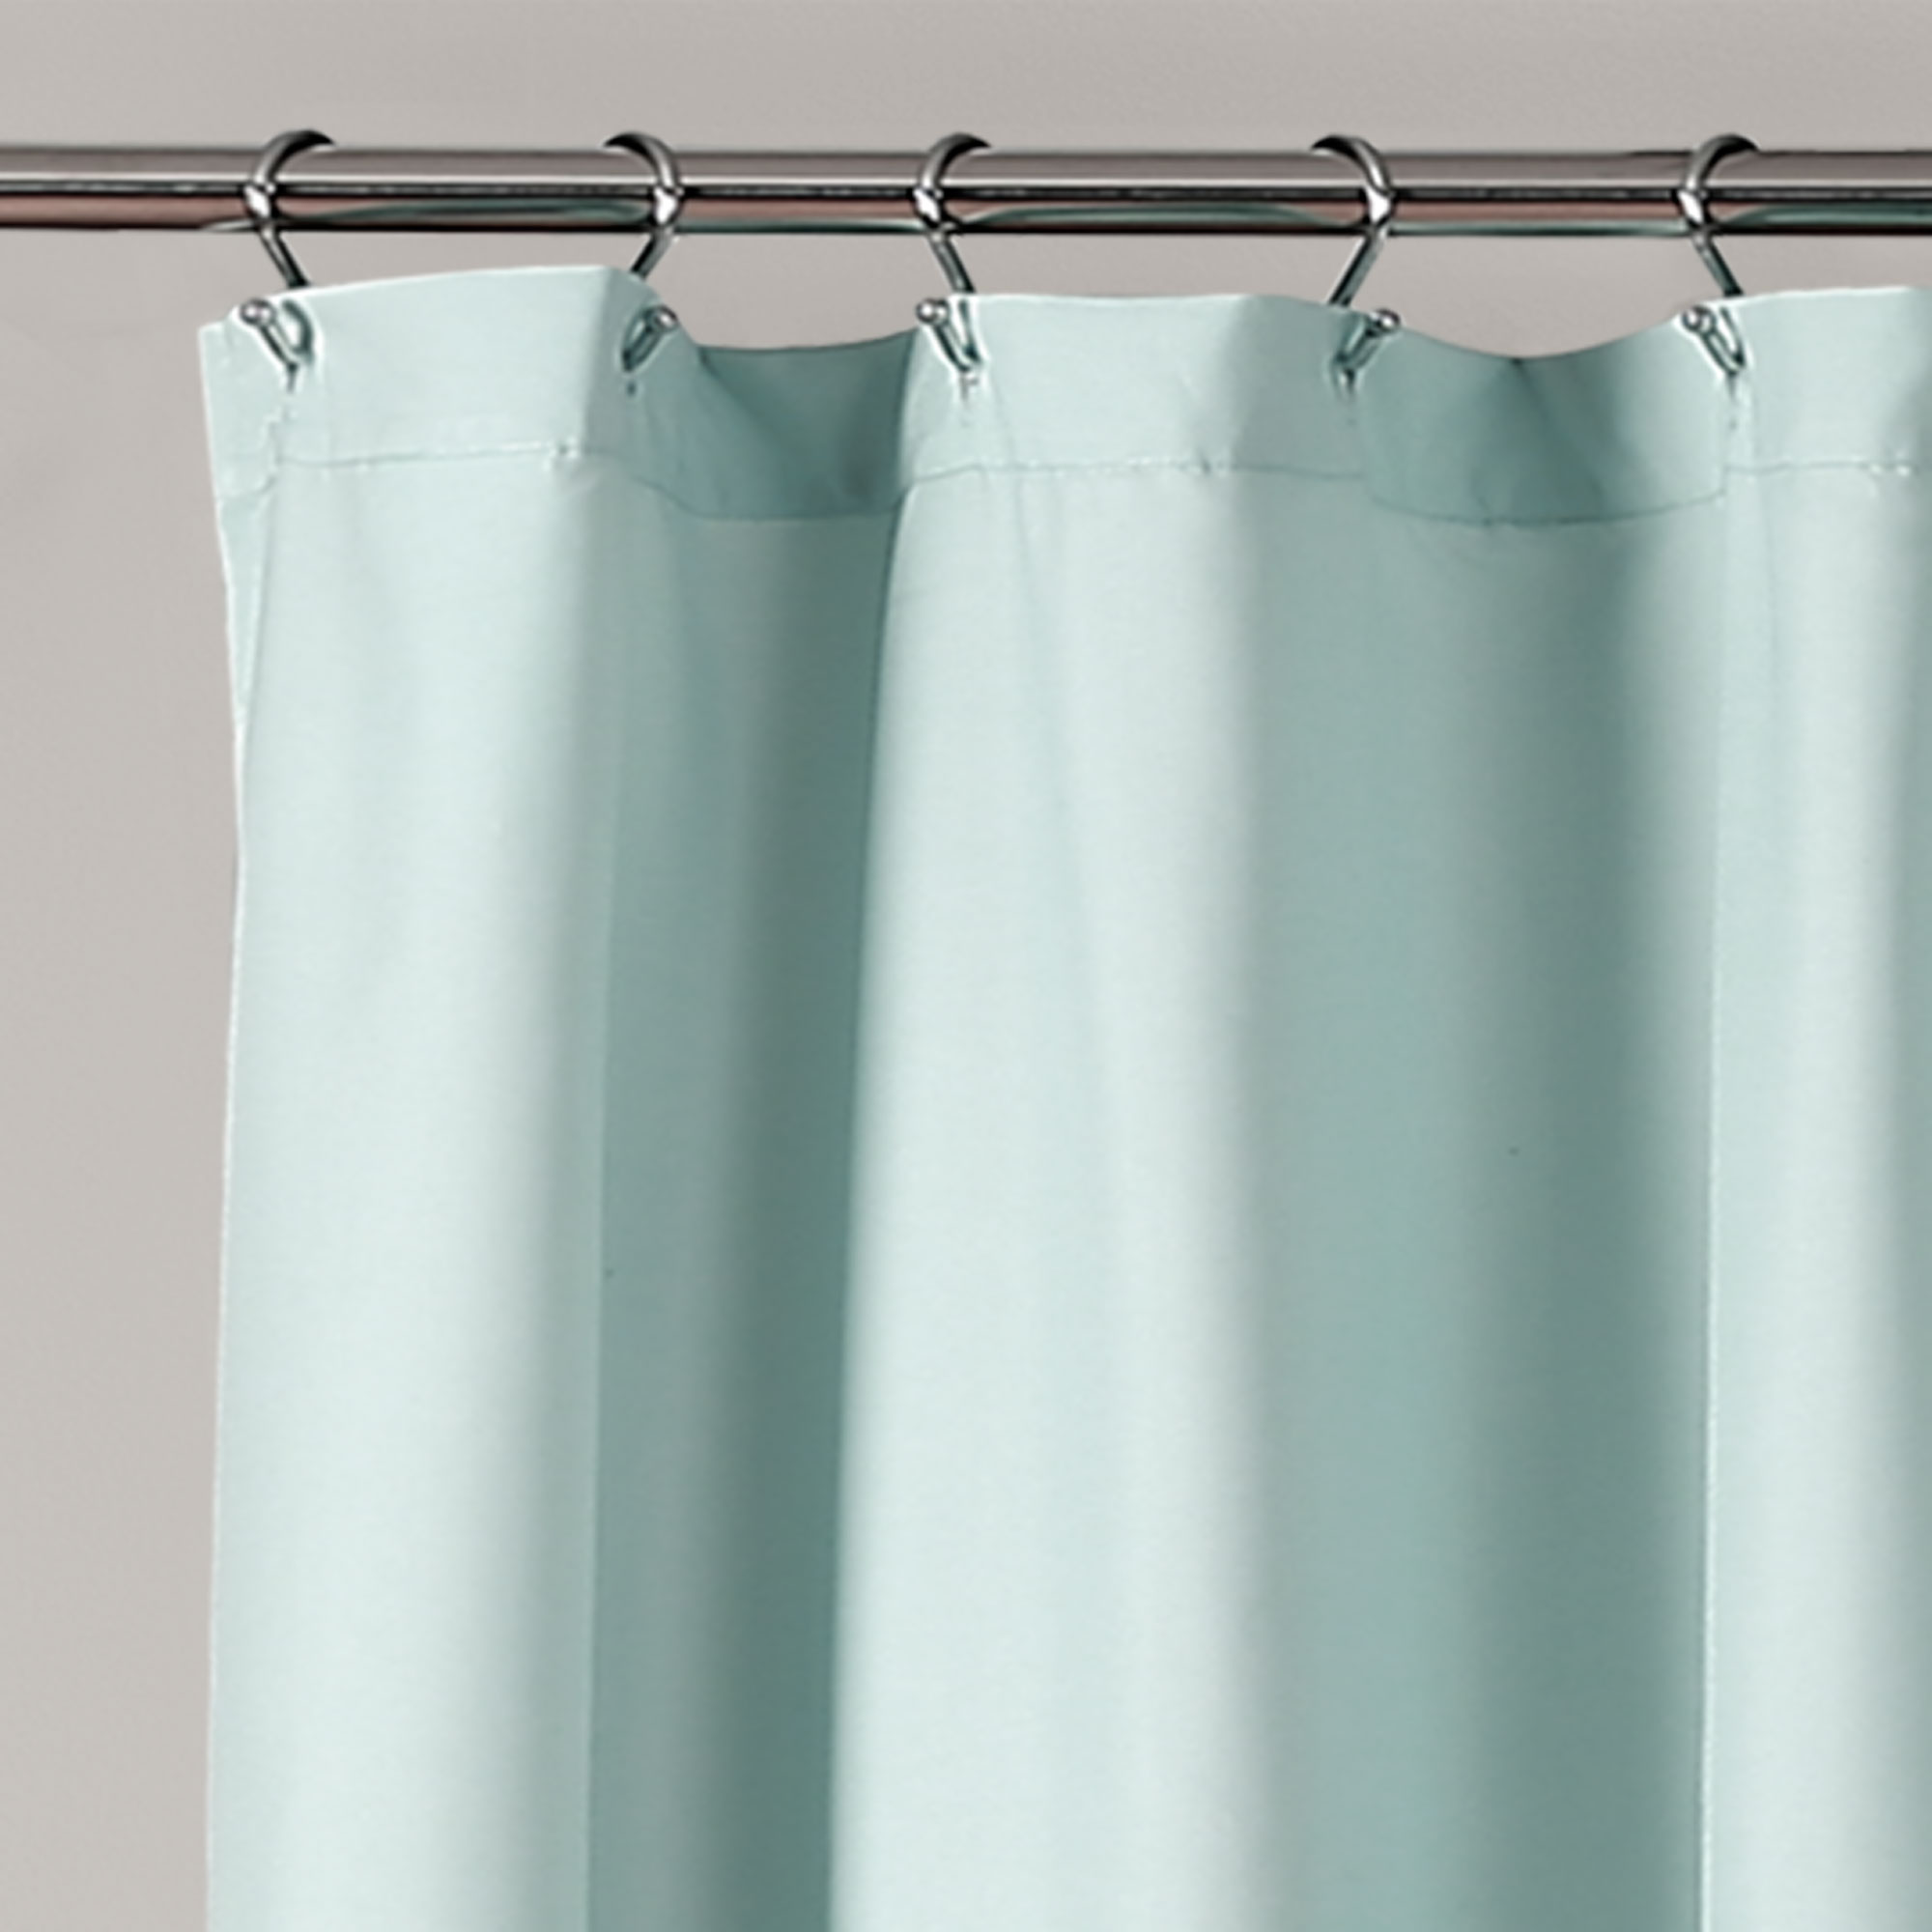 ella lace ruffle shower curtain white 72x72 ebay. Black Bedroom Furniture Sets. Home Design Ideas